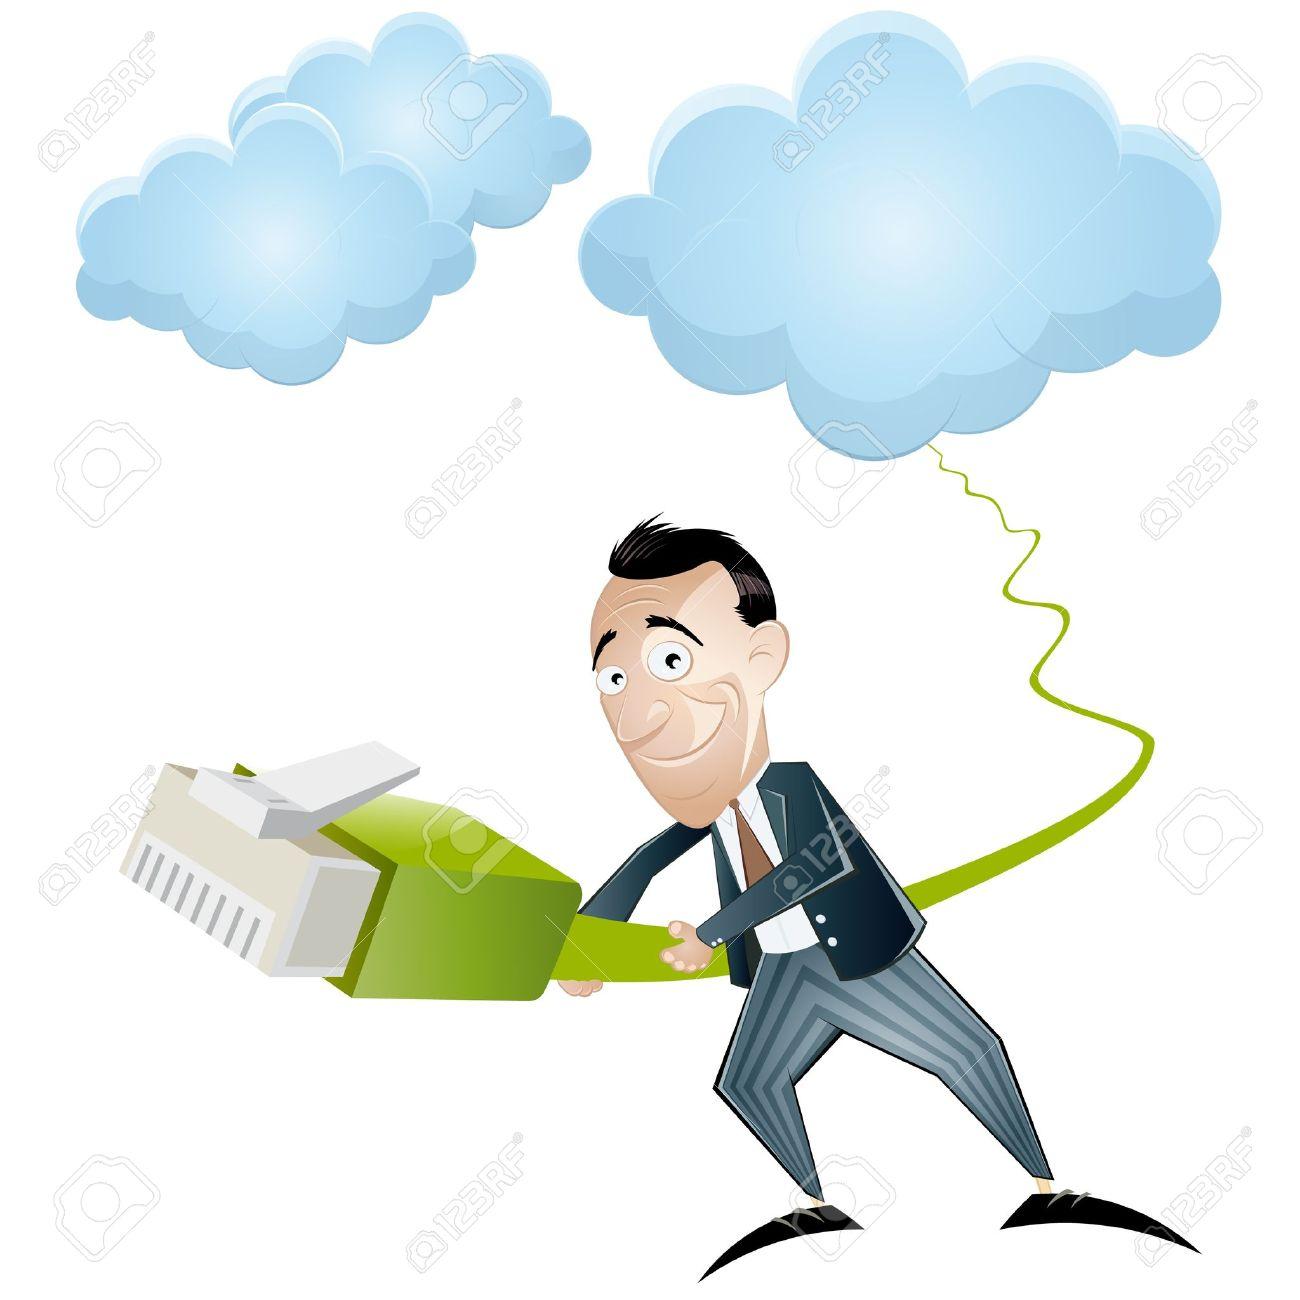 Cloud Computing Cartoon Royalty Free Cliparts, Vectors, And Stock.